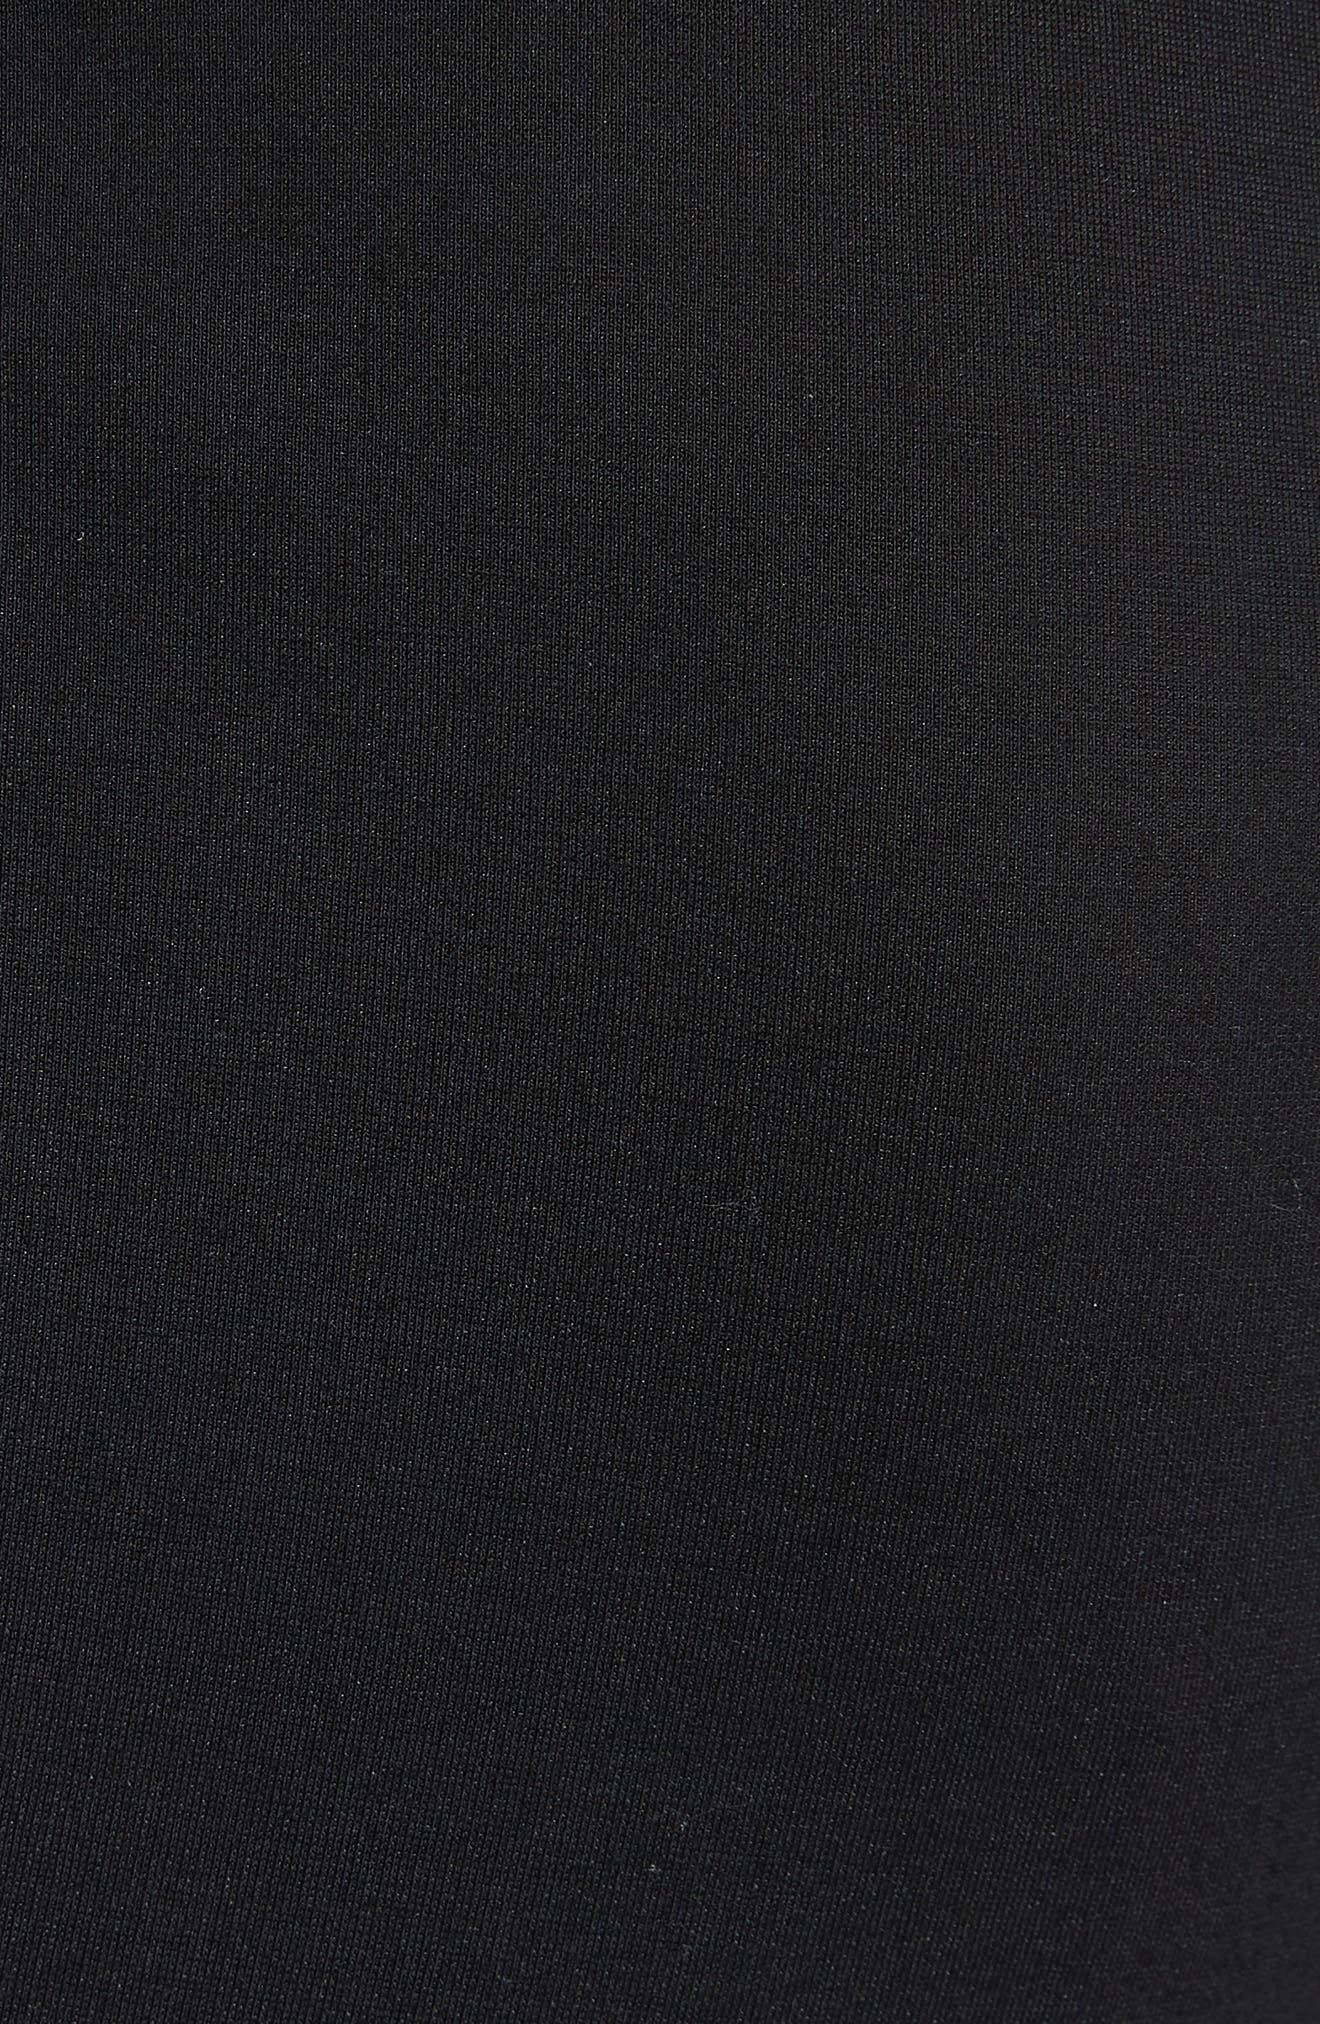 Rastrel Sheath Dress,                             Alternate thumbnail 5, color,                             001